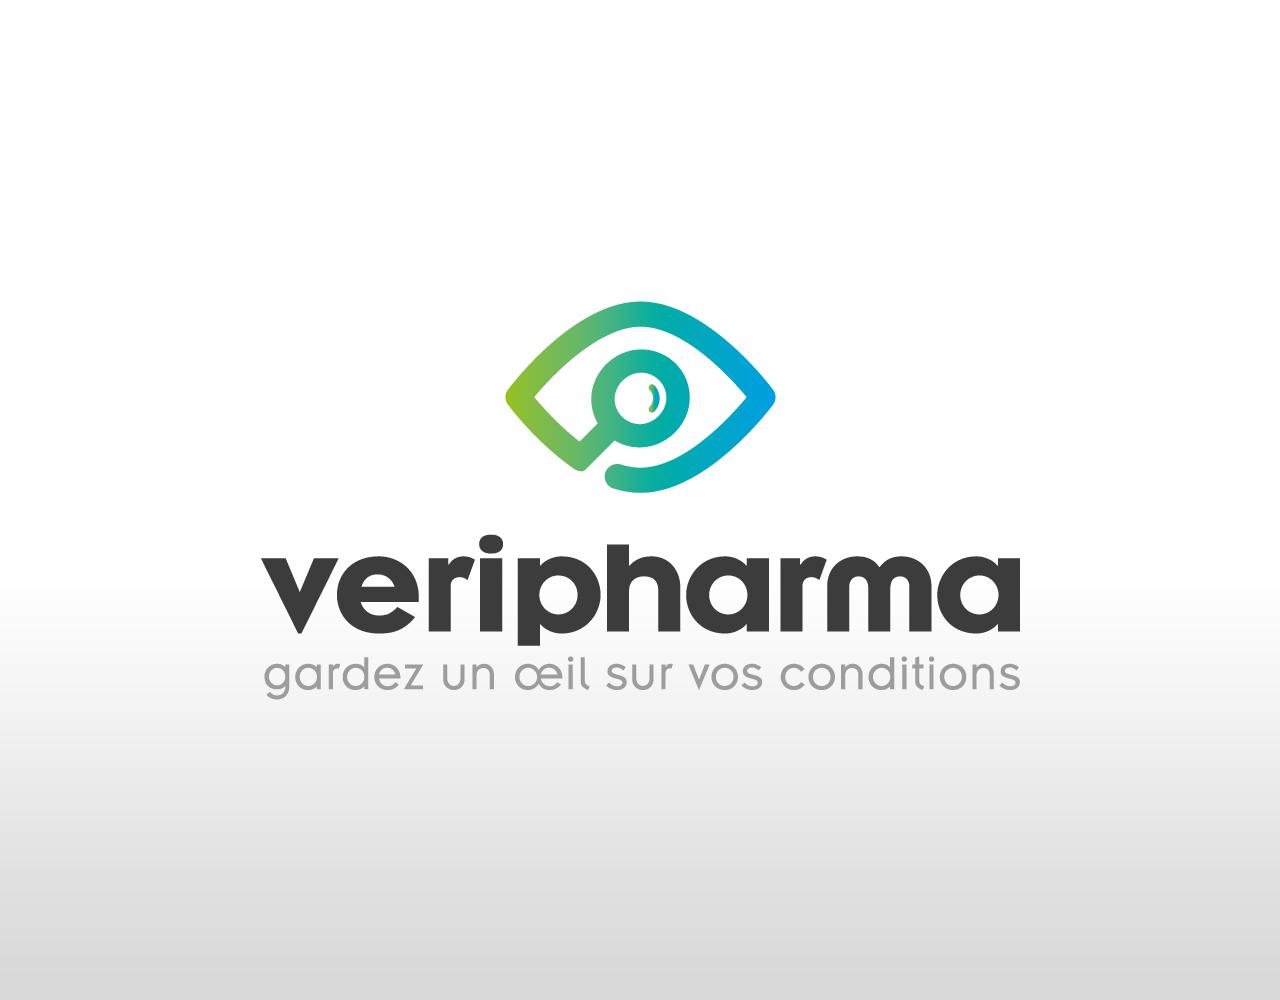 veripharma-creation-logo-charte-graphique-identite-visuelle-caconcept-alexis-cretin